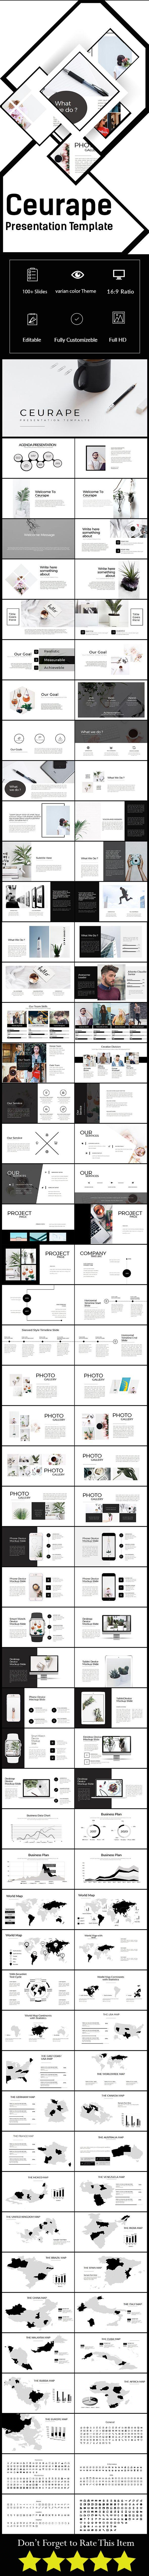 Ceurape Multipurpose Google Slide Template   Keynote, Ppt file and ...